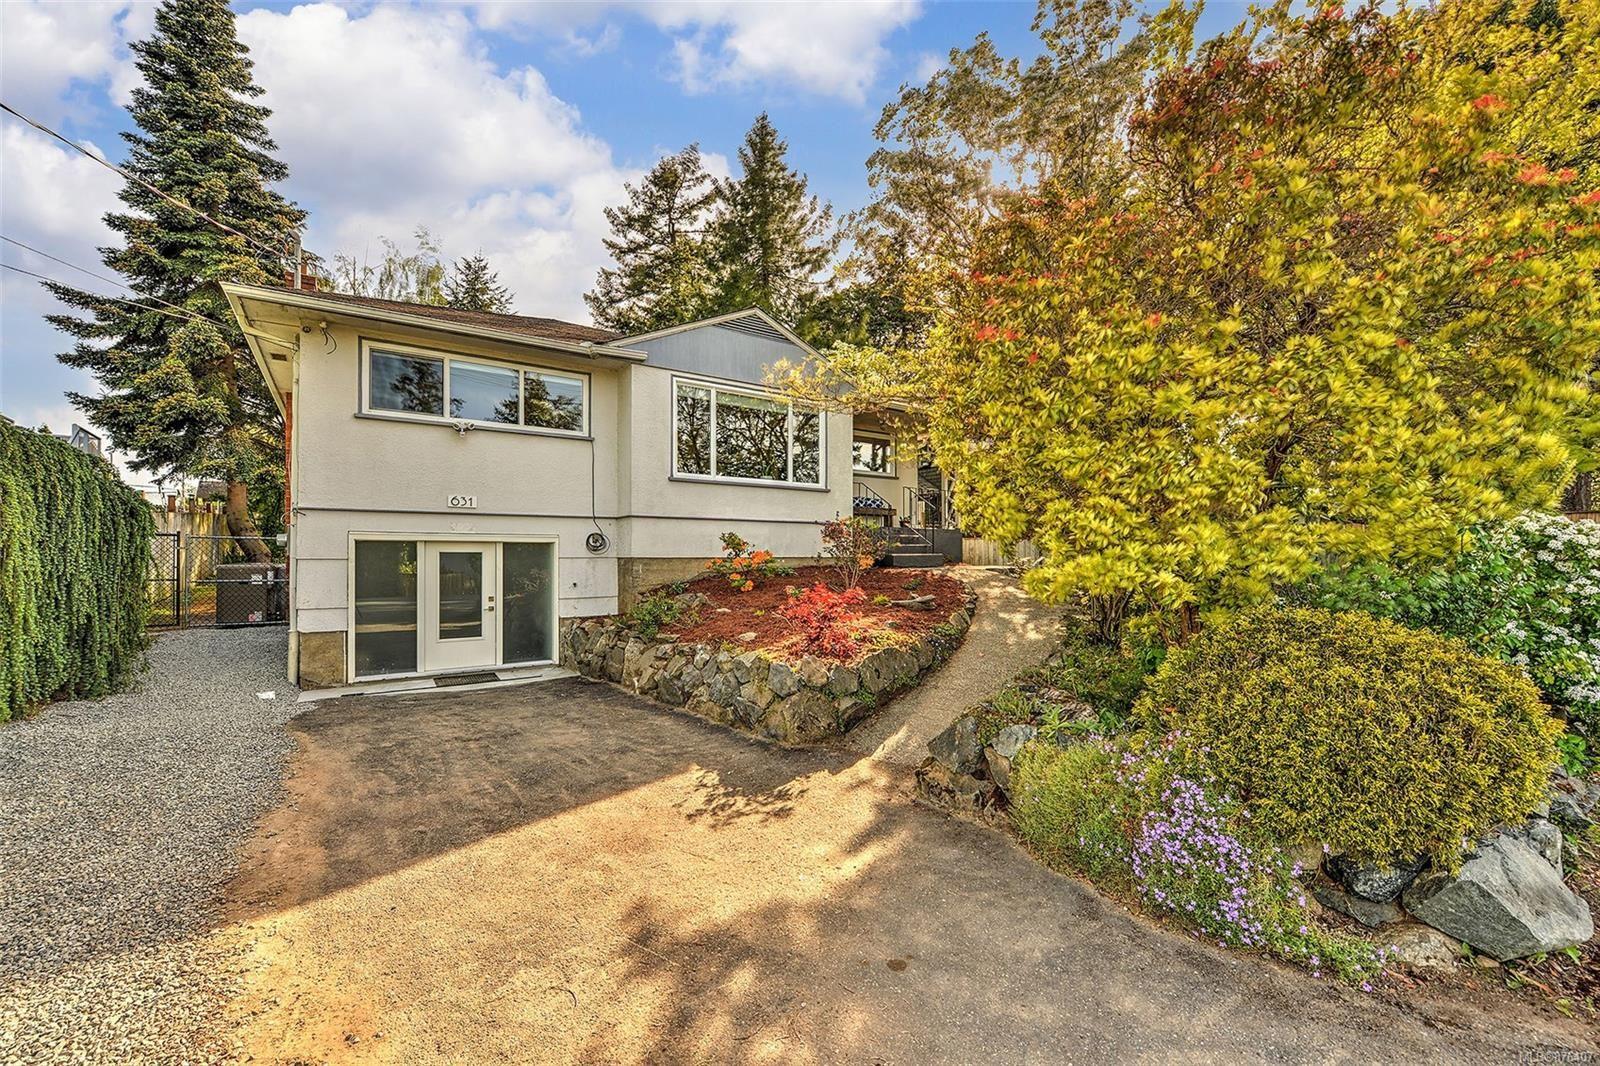 Photo 1: Photos: 631 Cowper St in Saanich: SW Gorge House for sale (Saanich West)  : MLS®# 876407